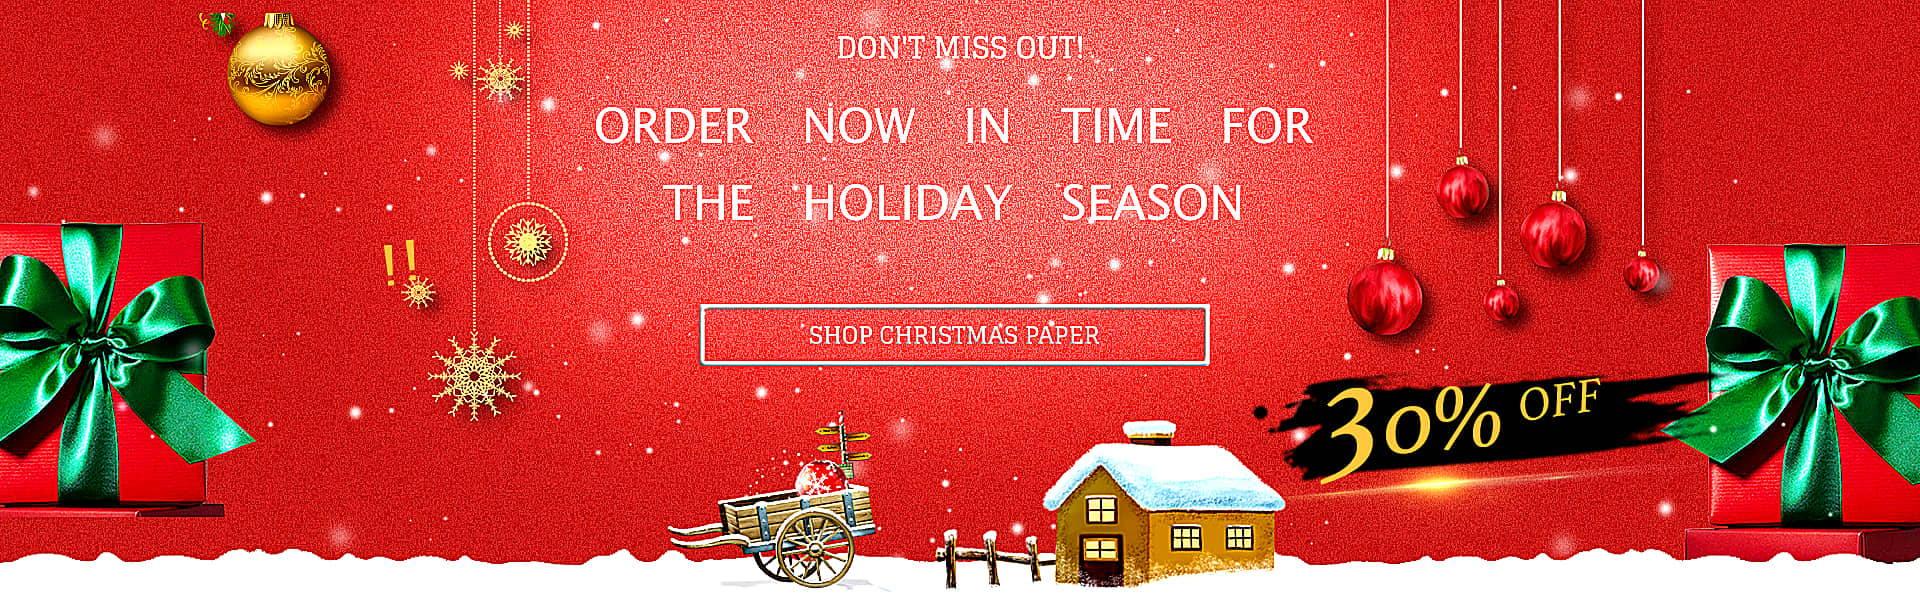 Origami Time Christmas Banner